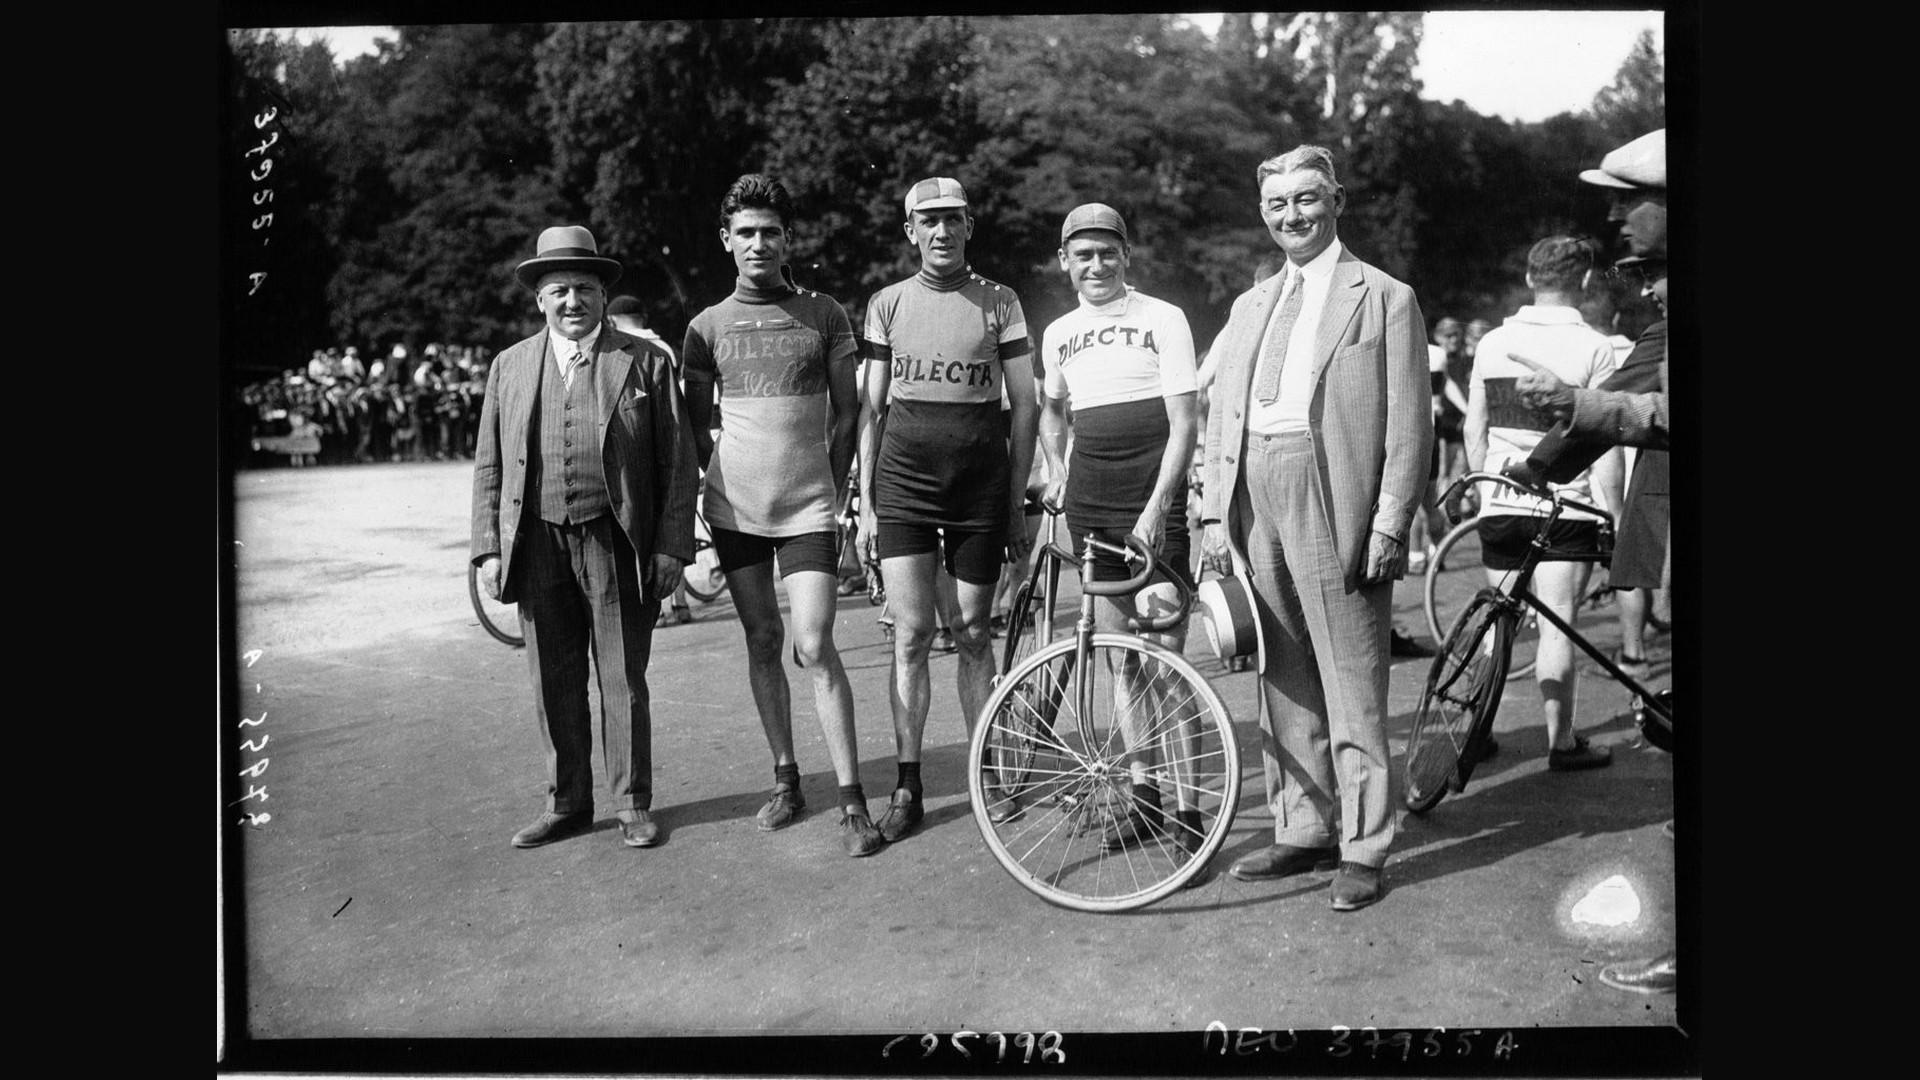 Dilecta x vélo (cyclisme) (2)